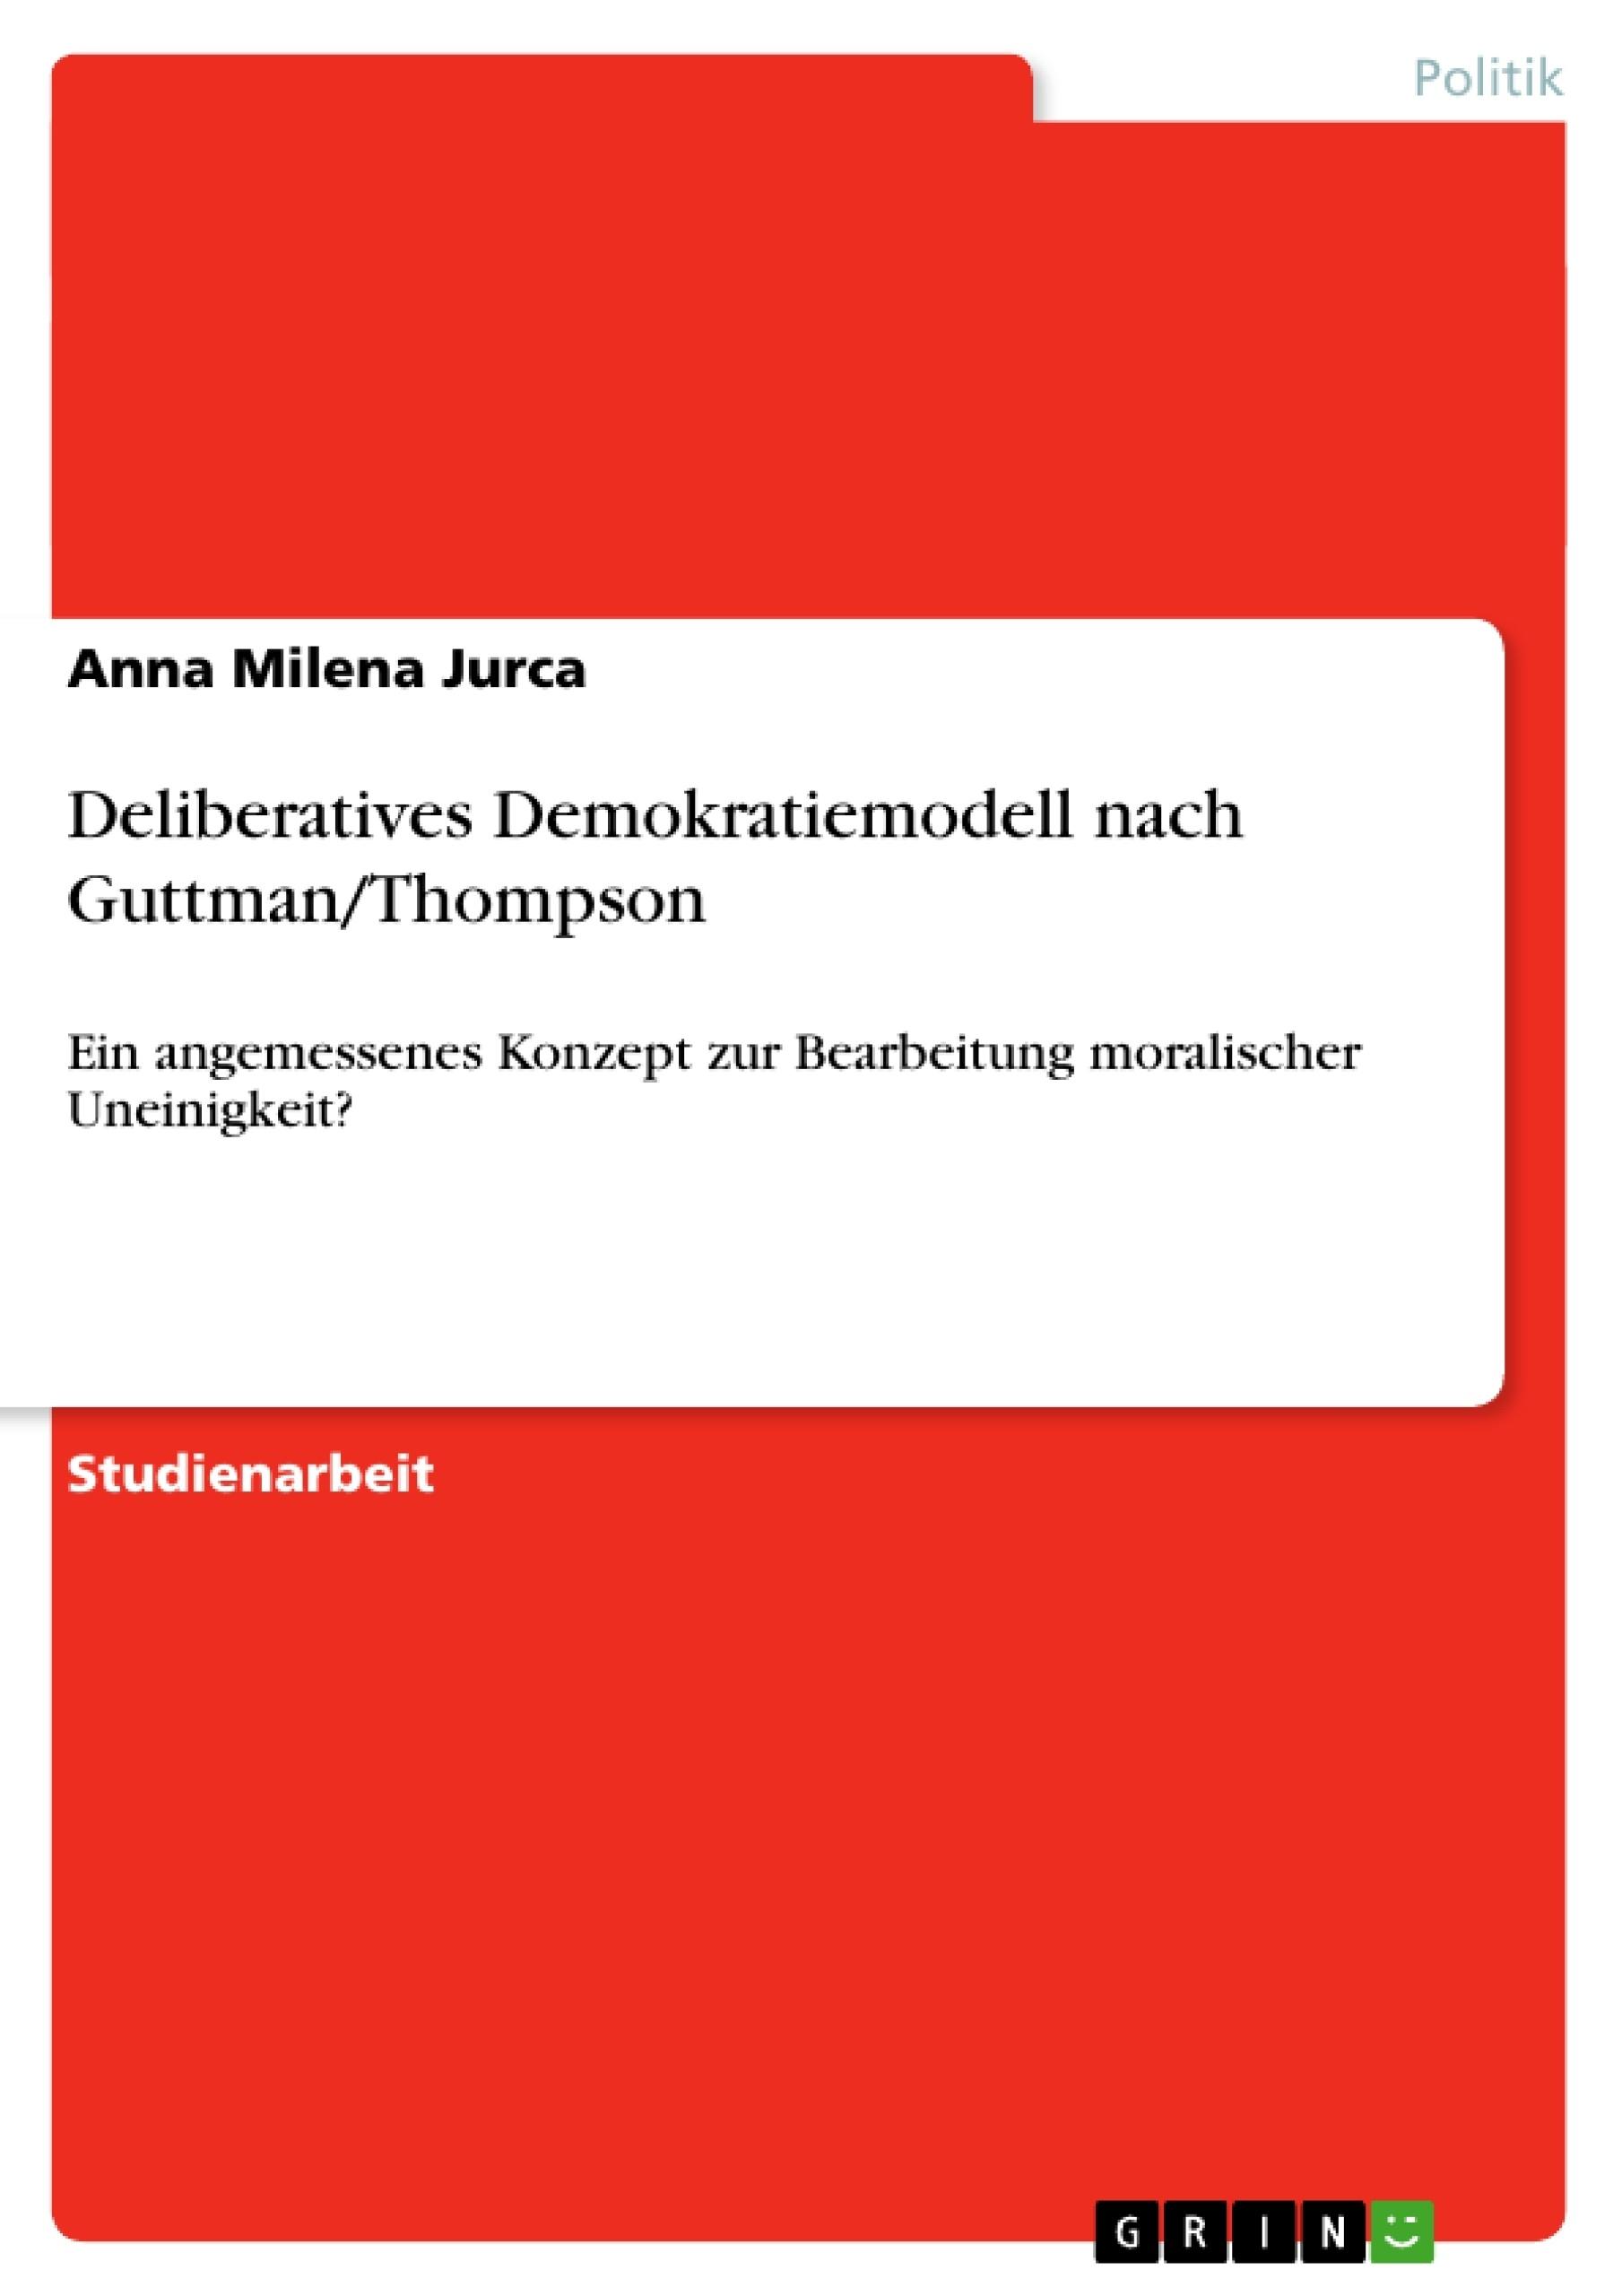 Titel: Deliberatives Demokratiemodell nach Guttman/Thompson